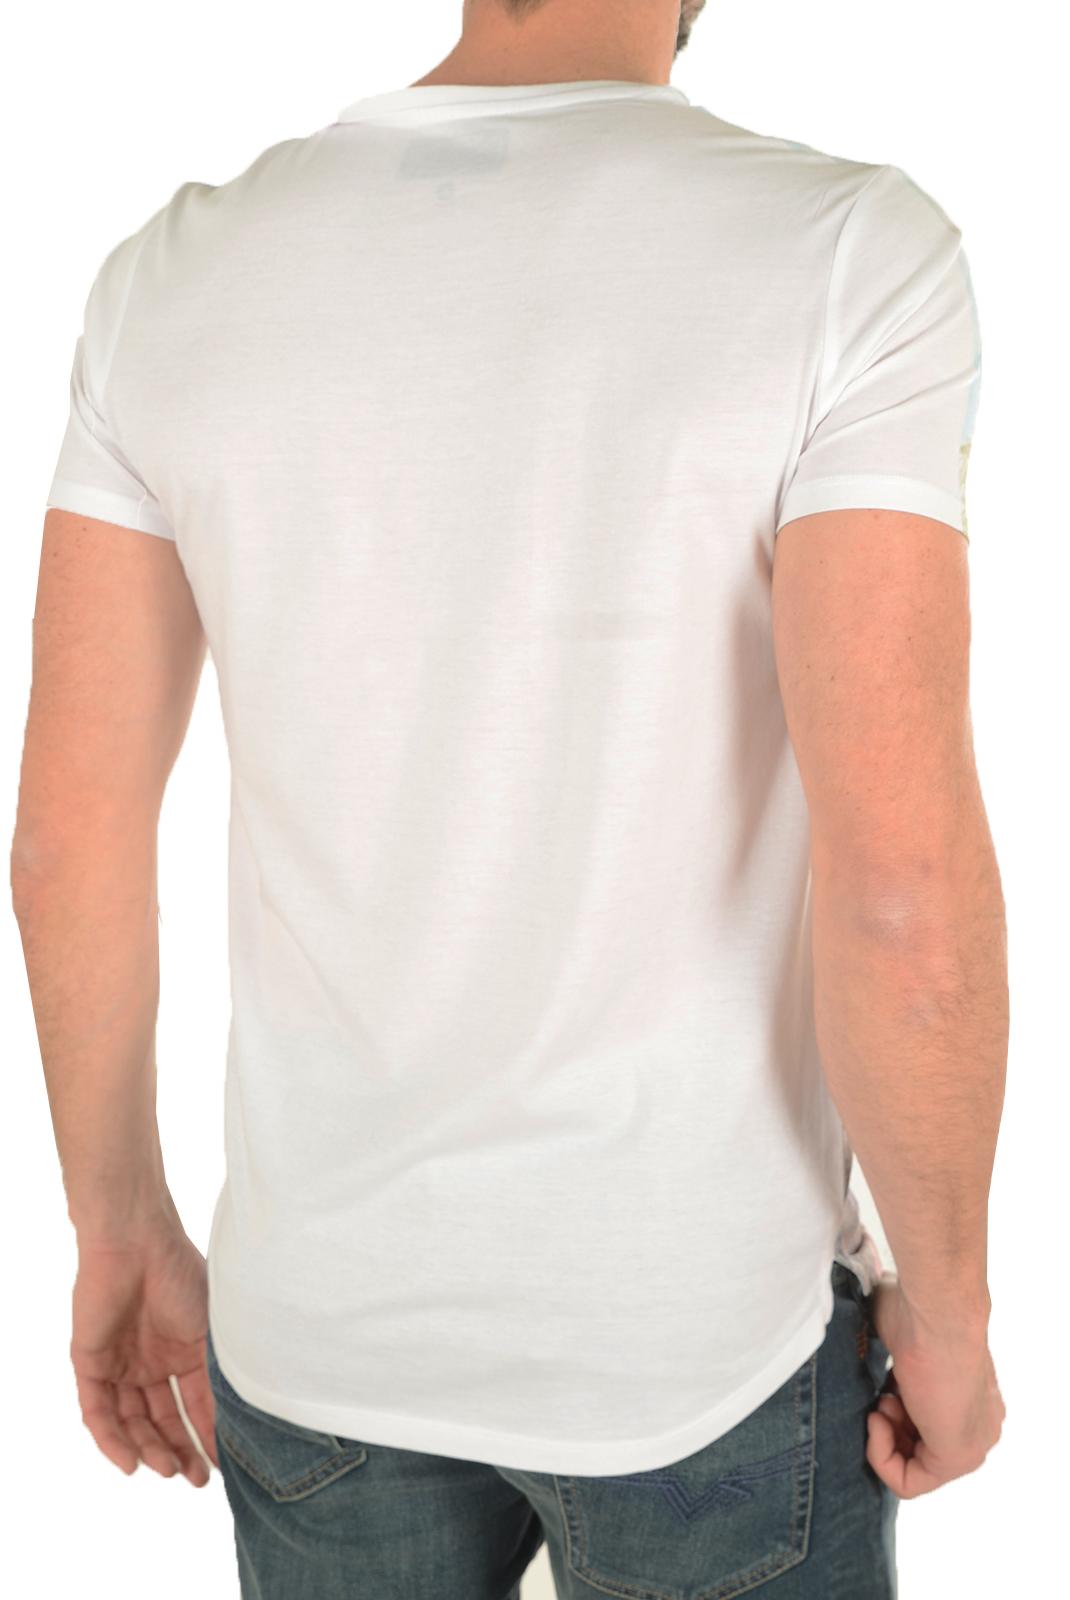 Tee-shirts  Guess jeans M72I63 K5K40 A009 OPTIC WHITE